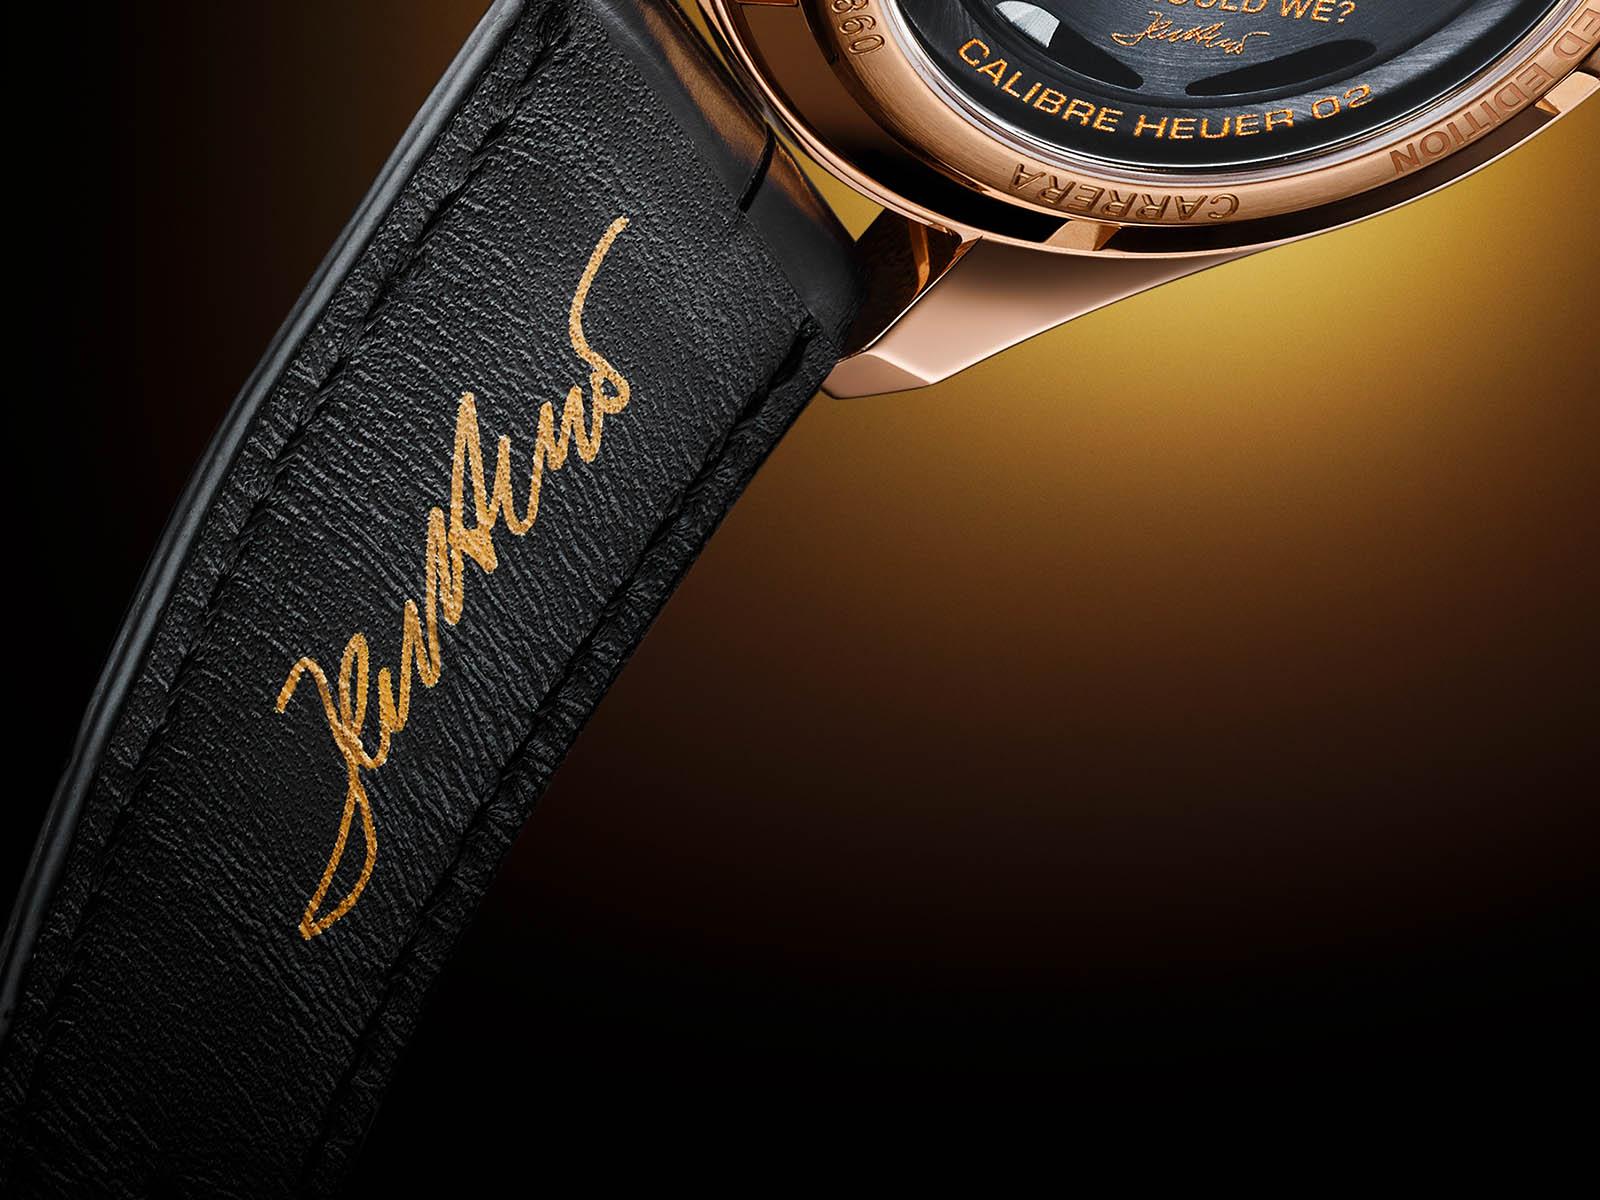 cbn2041-fc8306-tag-heuer-carrera-chronograph-jack-heuer-birthday-gold-7.jpg